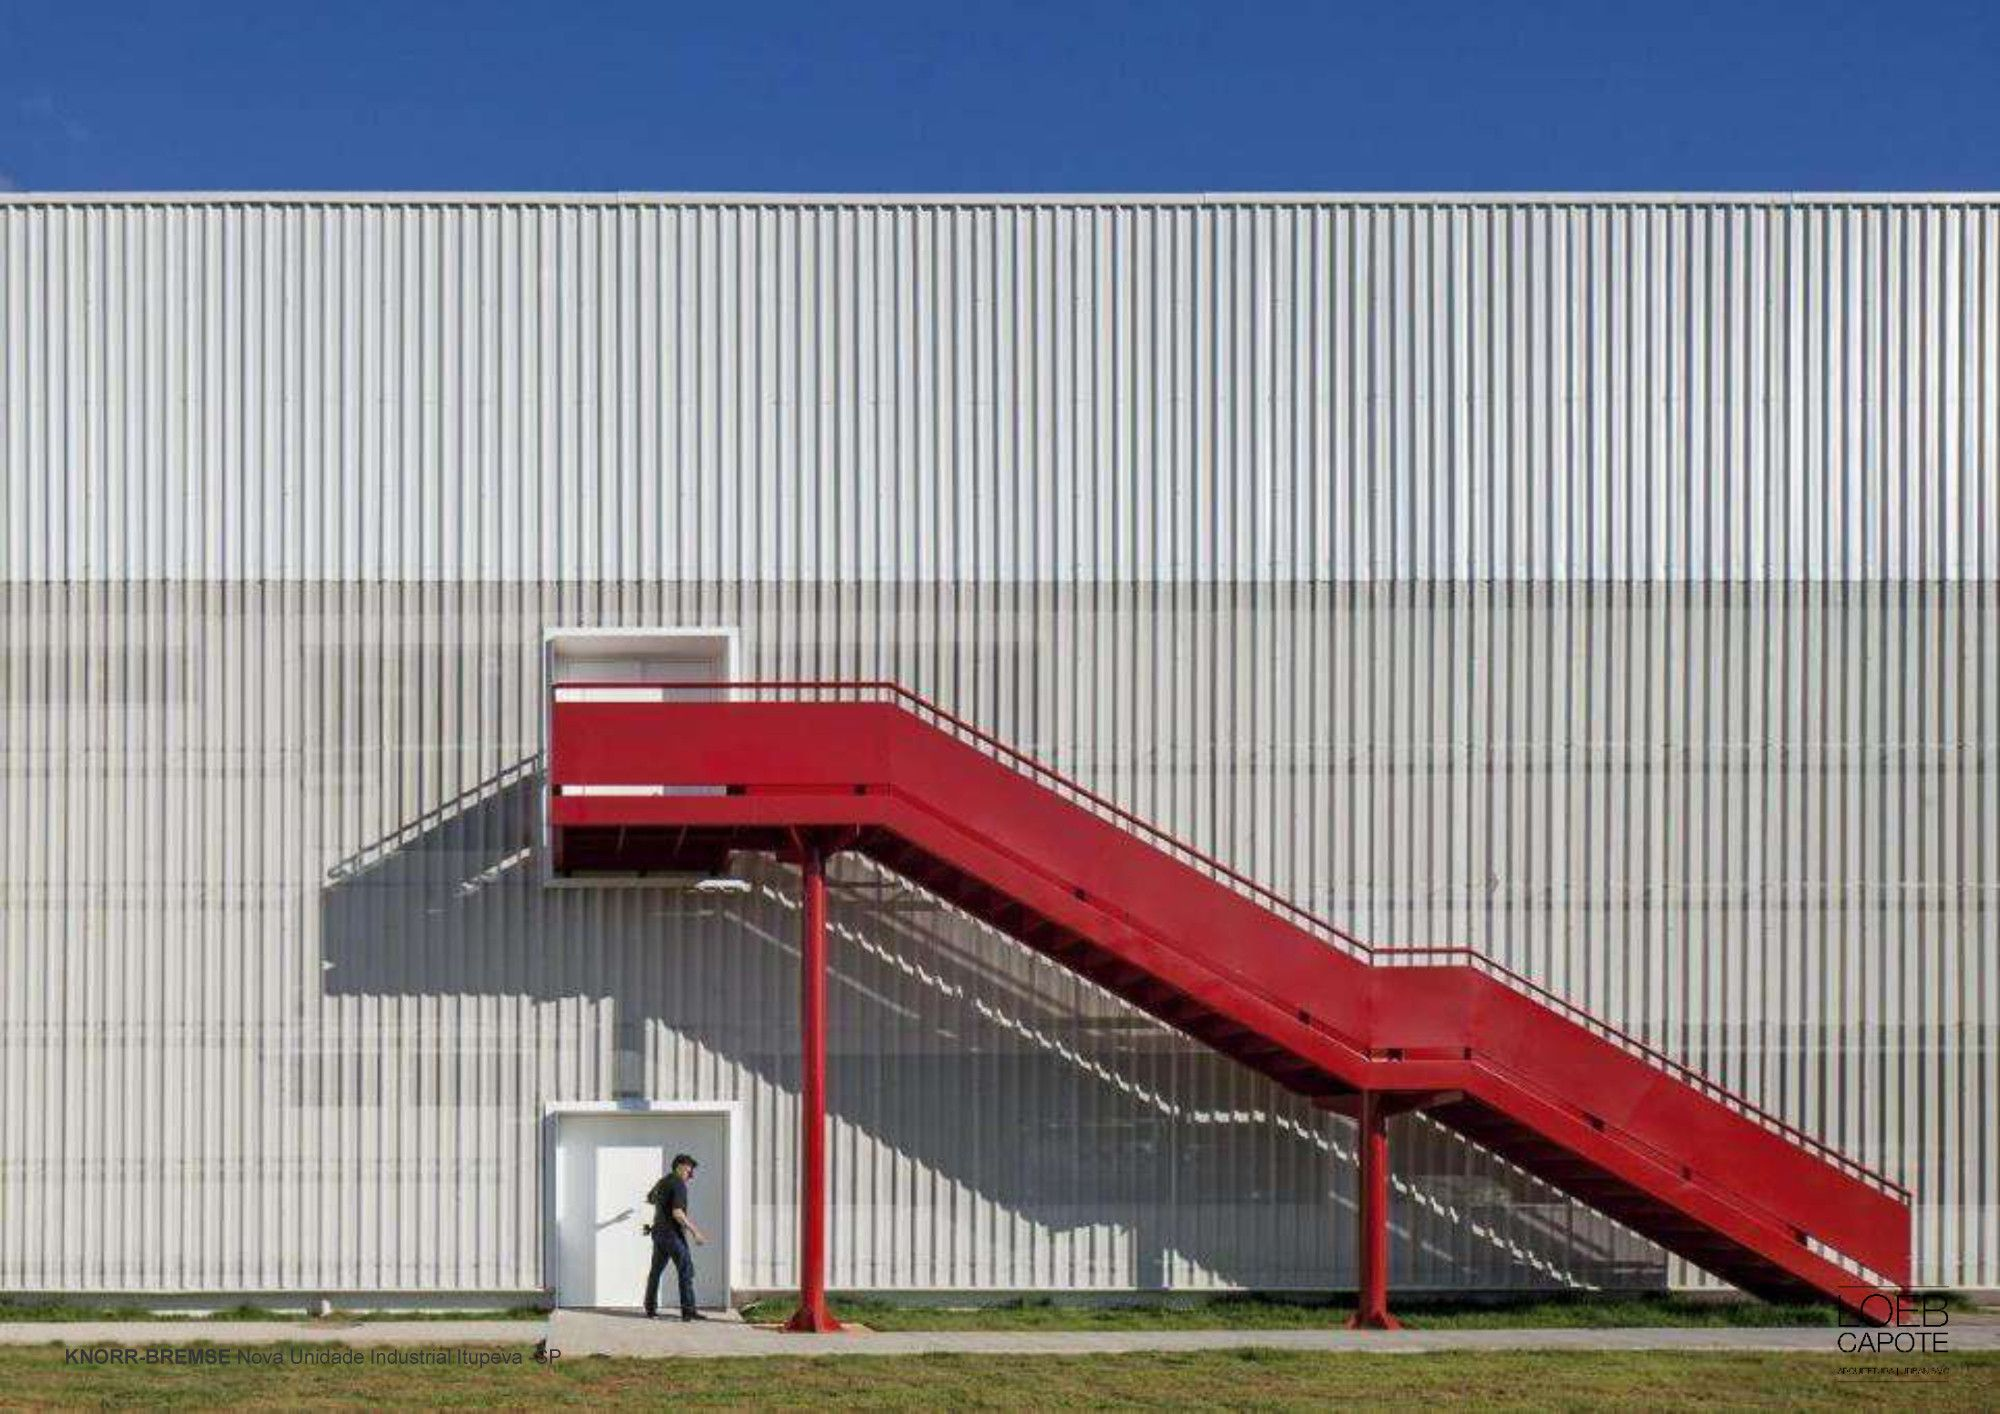 Knorr-Bremse,Cortesia de LoebCapote Arquitetura e Urbanismo